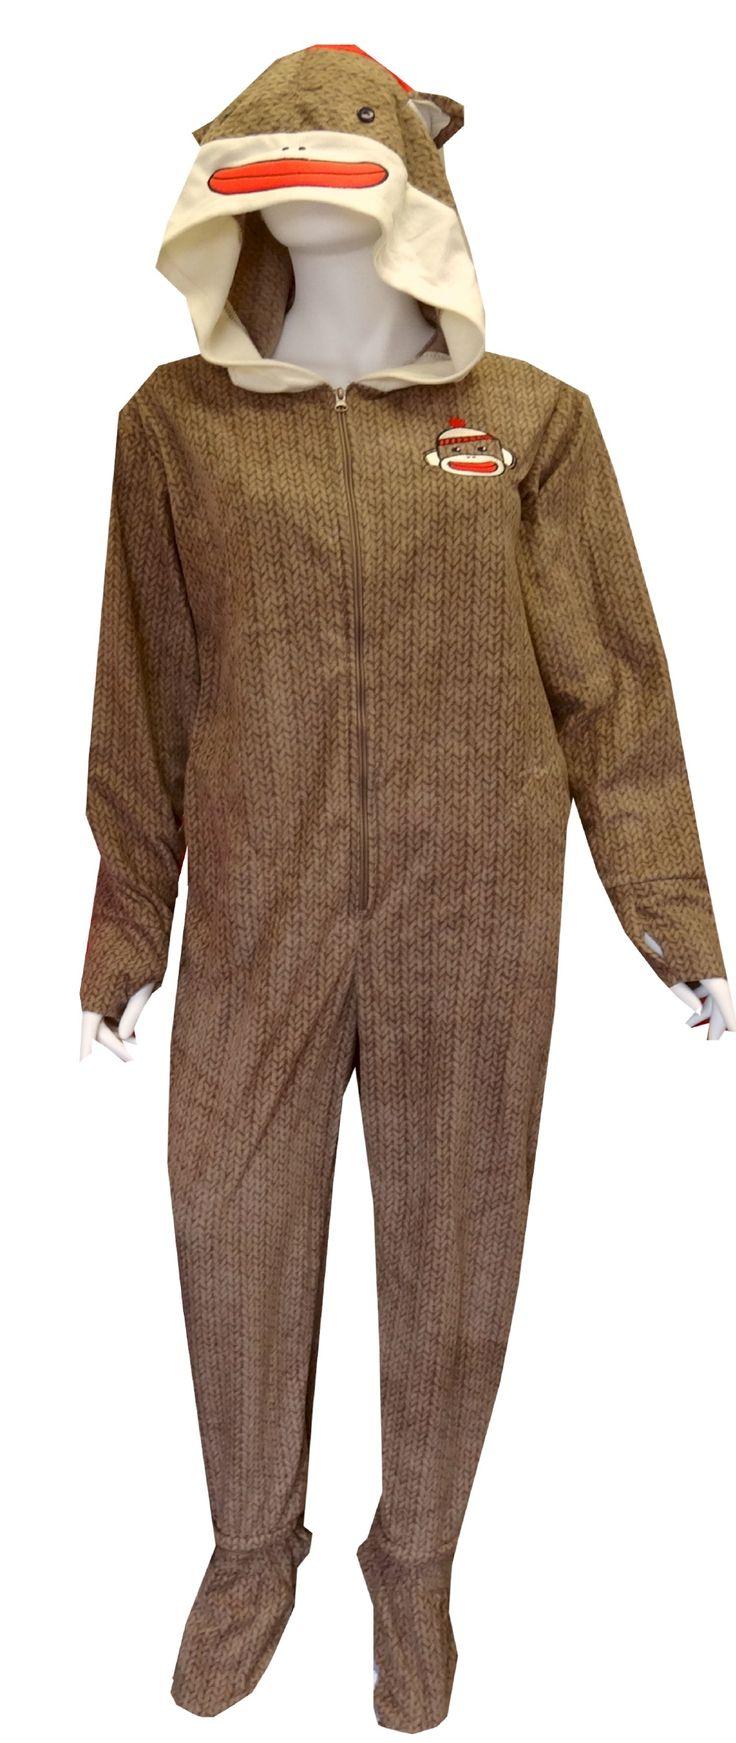 Sock Monkey Fleece Onesie Footie Pajamas With Hood Now You